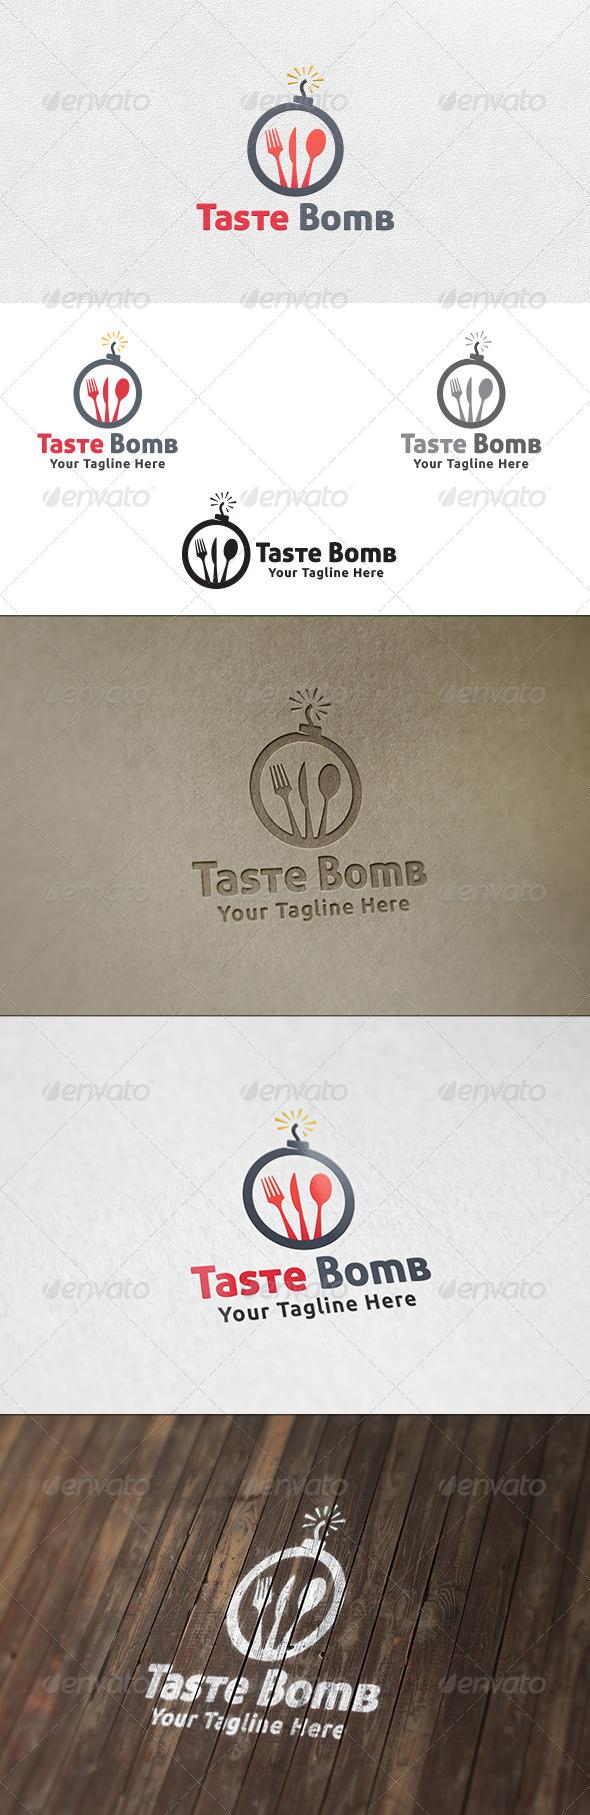 GraphicRiver Taste Bomb Logo Template 6550643